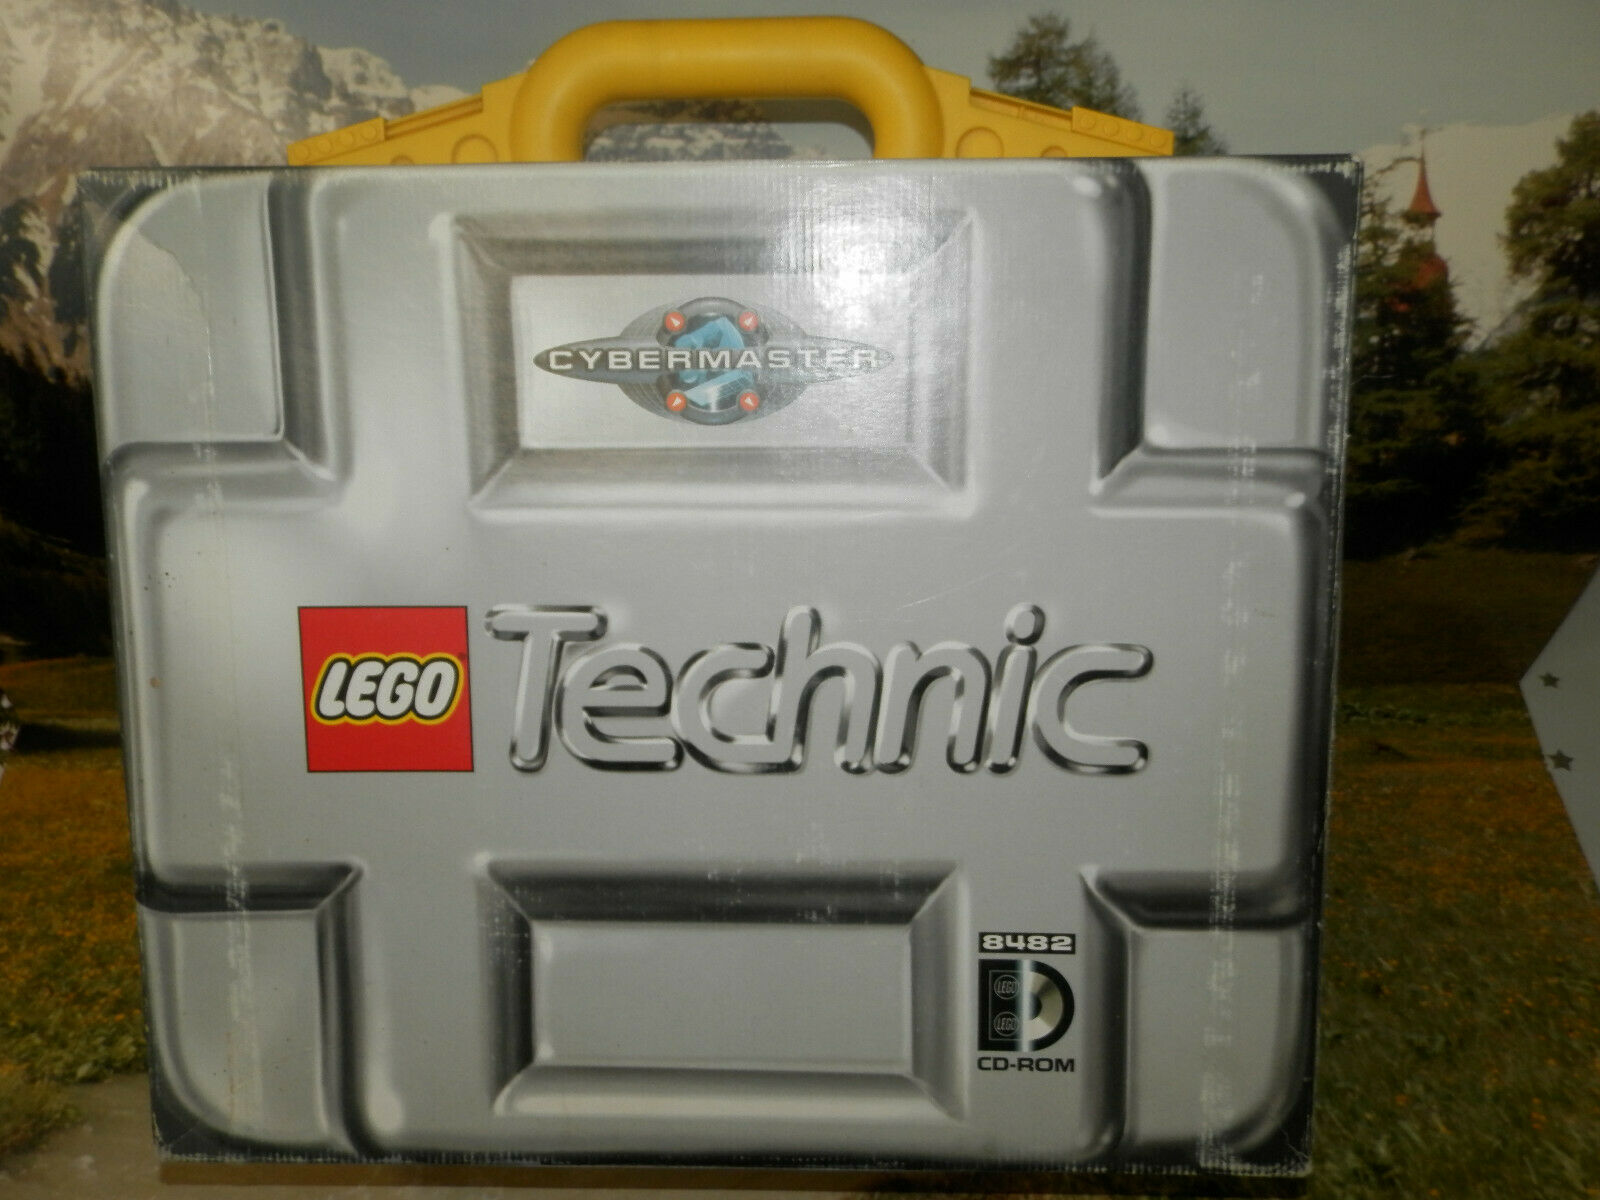 Raro Lego Technic Cyber Master 8482-Vintage Lego